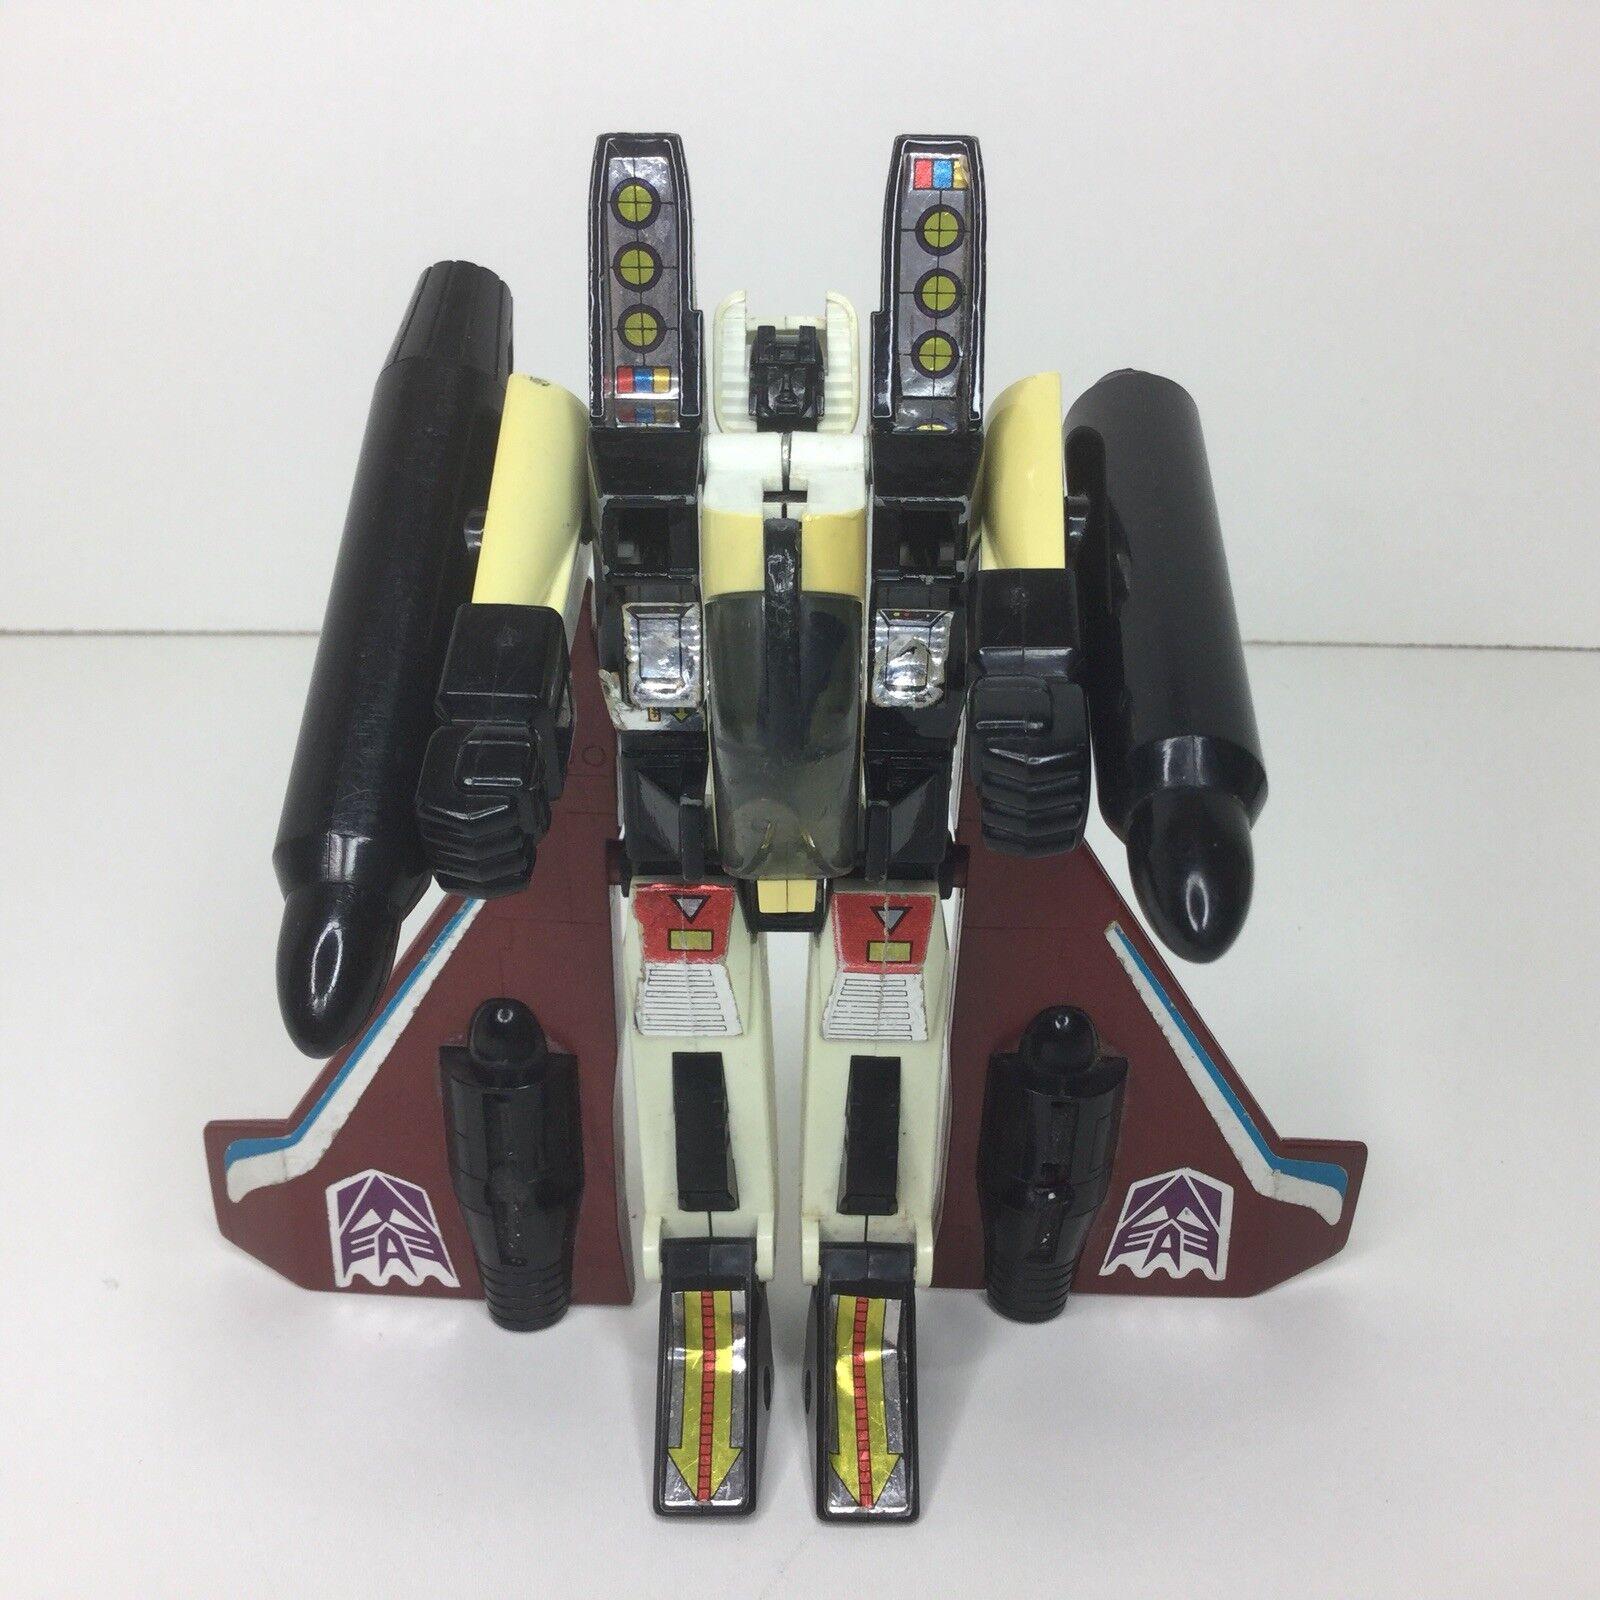 Hasbro Vintage G1 Transformers Conehead Ramjet Action Figure Figure Figure Complete Decepticon 6cac95